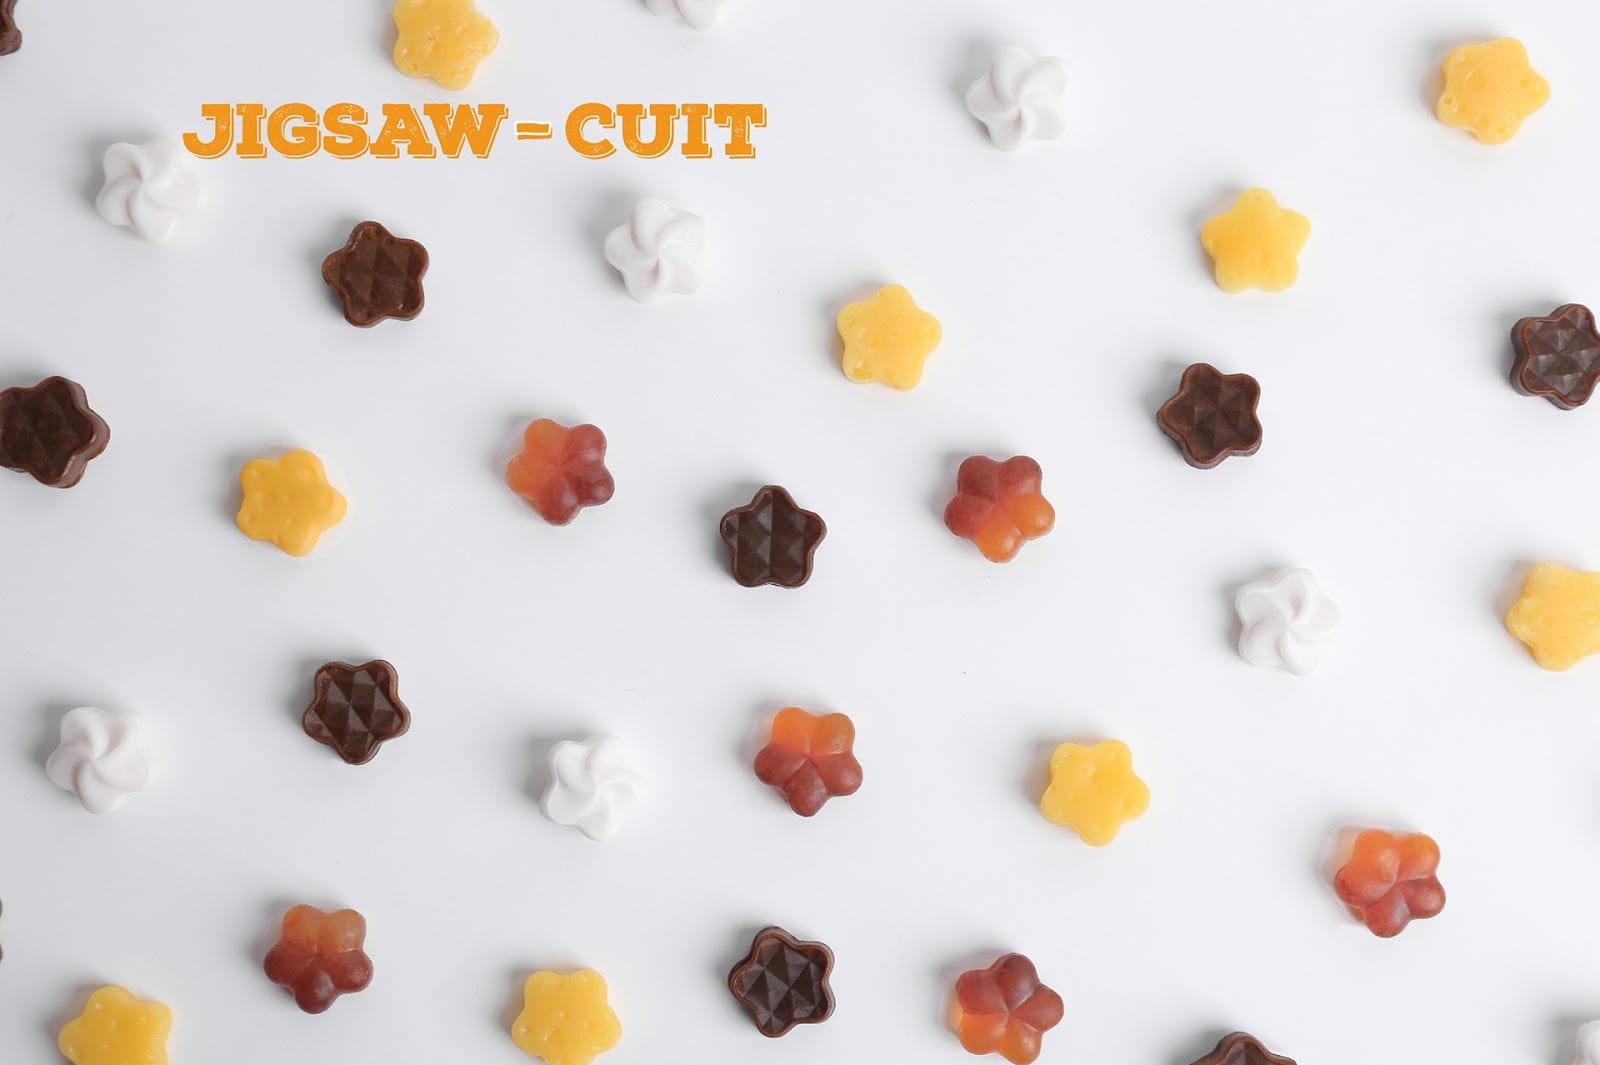 jigsaw cuit 02 - Ach, tie obaly – Jigsaw Cuit